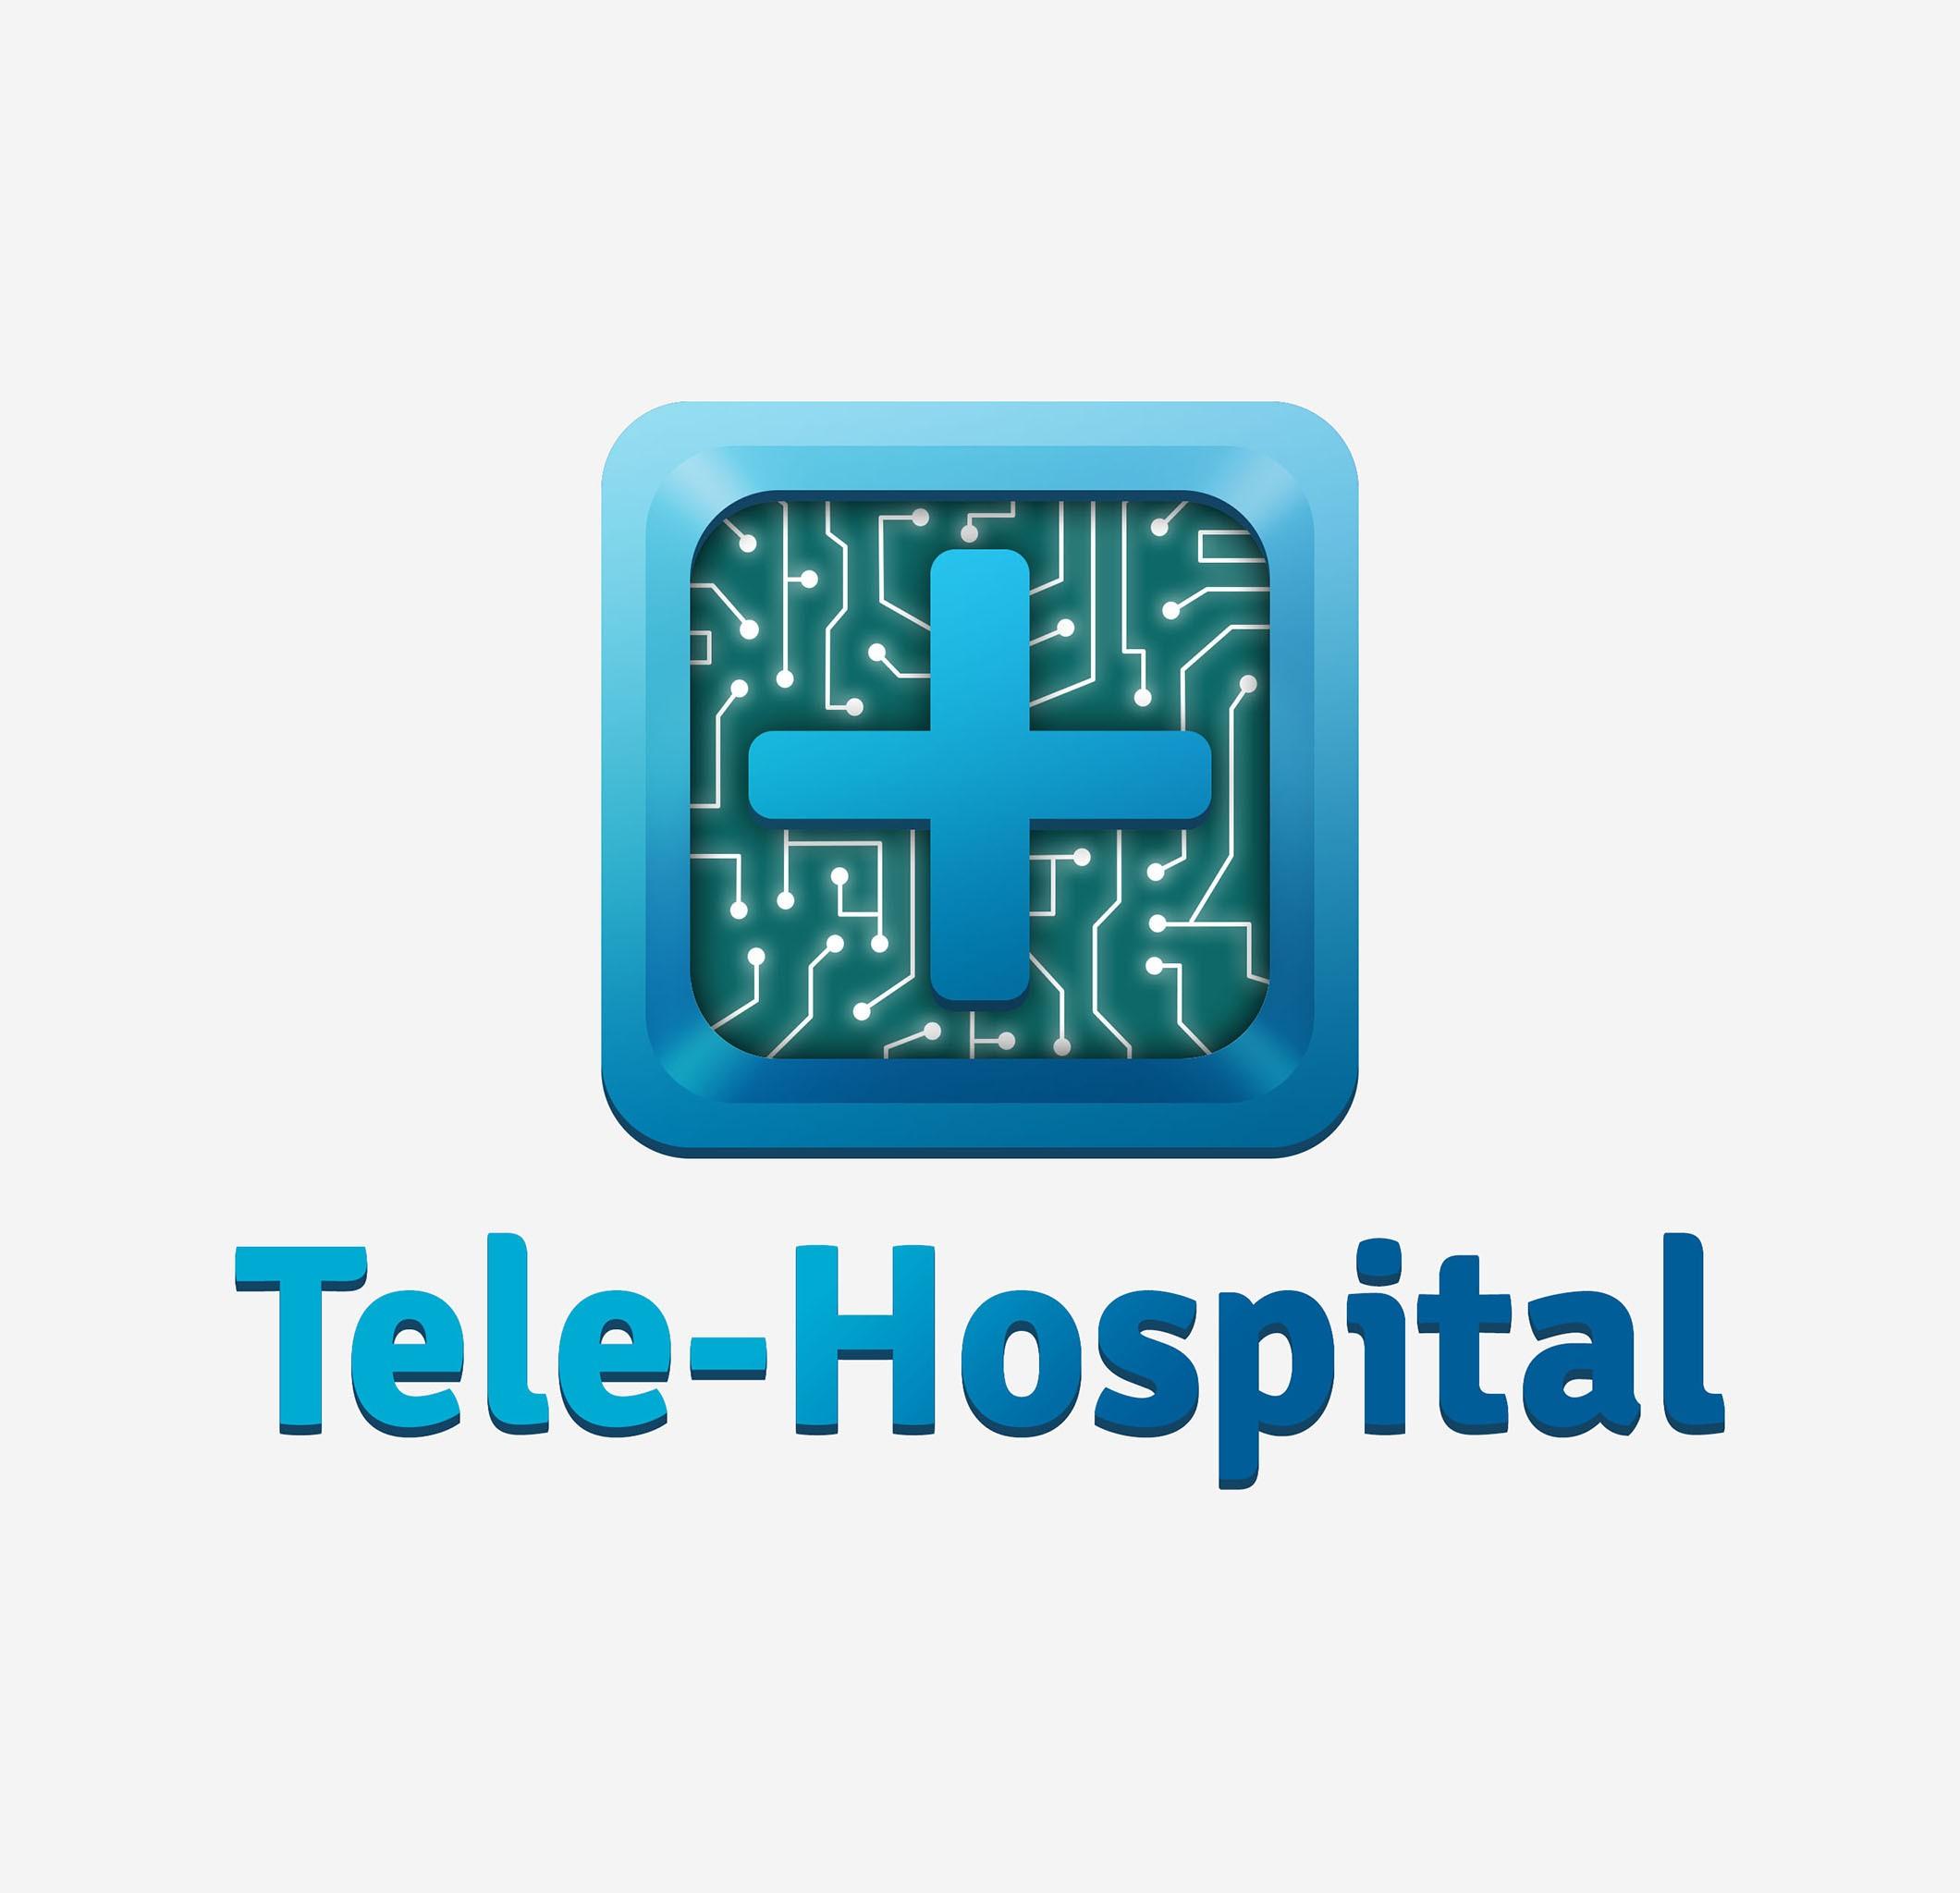 logo tele-hospital